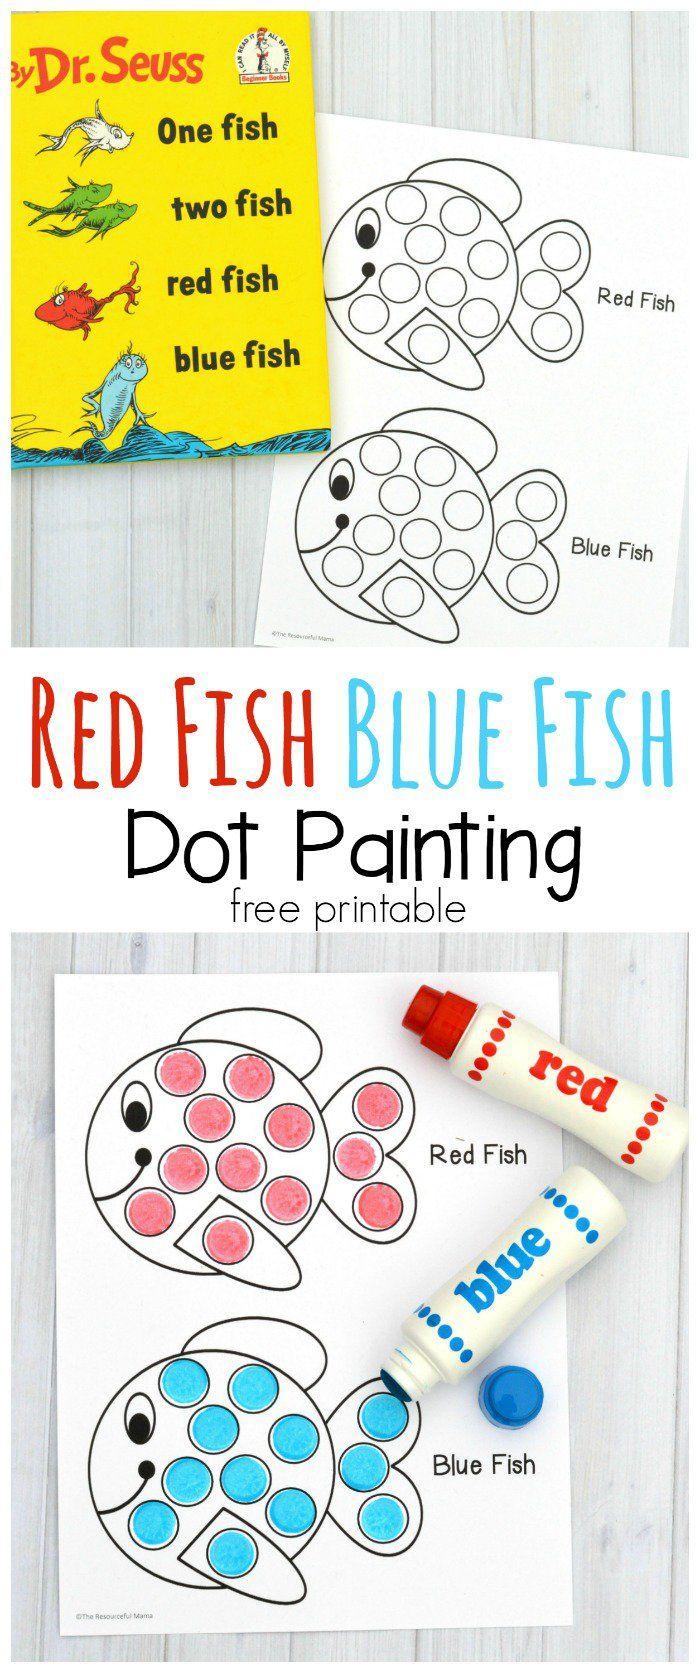 photo regarding Dr.seuss Fish Printable named Pink Fish Blue Fish Dot Portray Sport Dr Seuss Dr